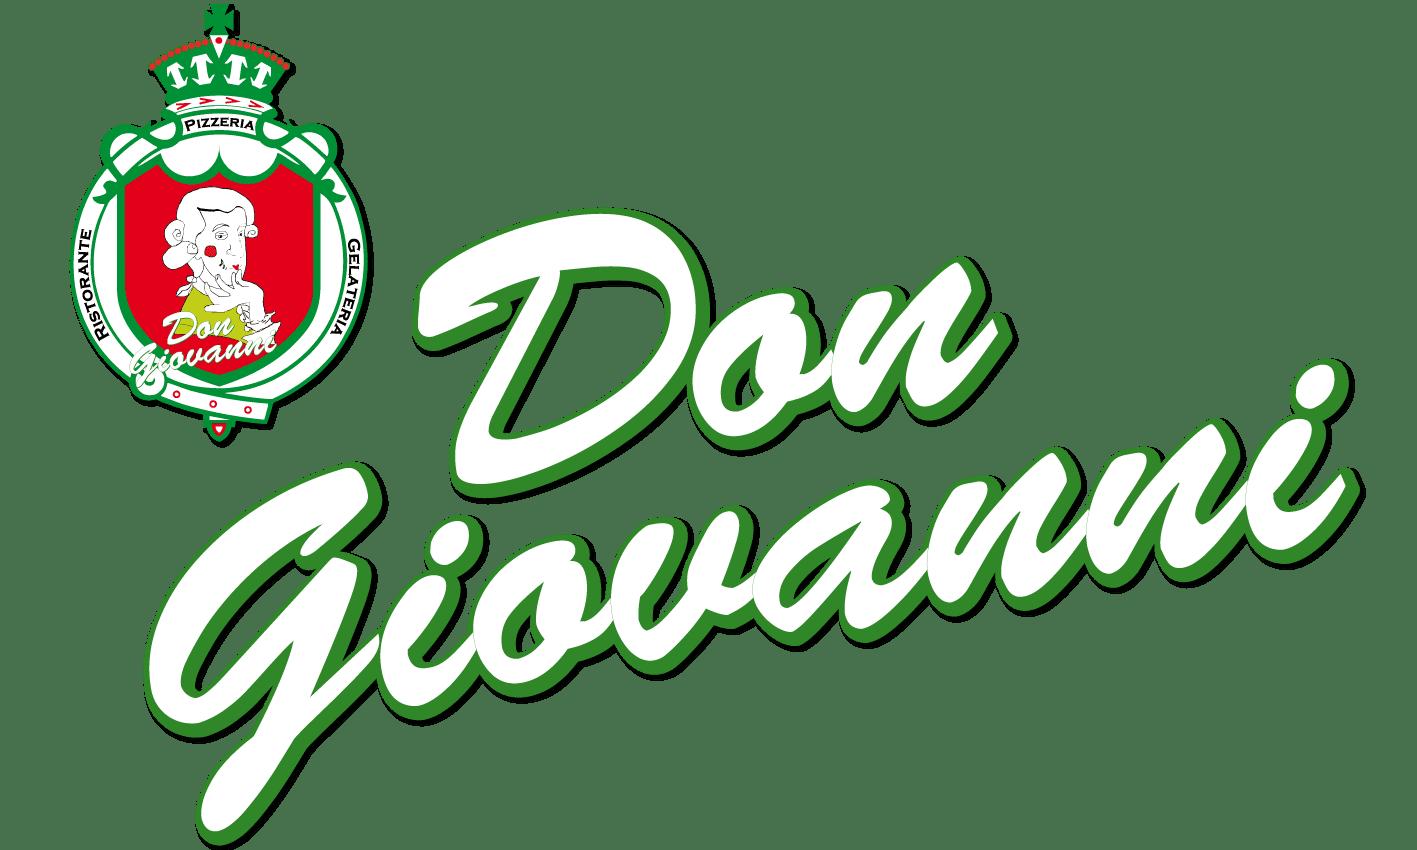 italiener don Giovanni Erfurt pizza pasta Italiener italienisch essen